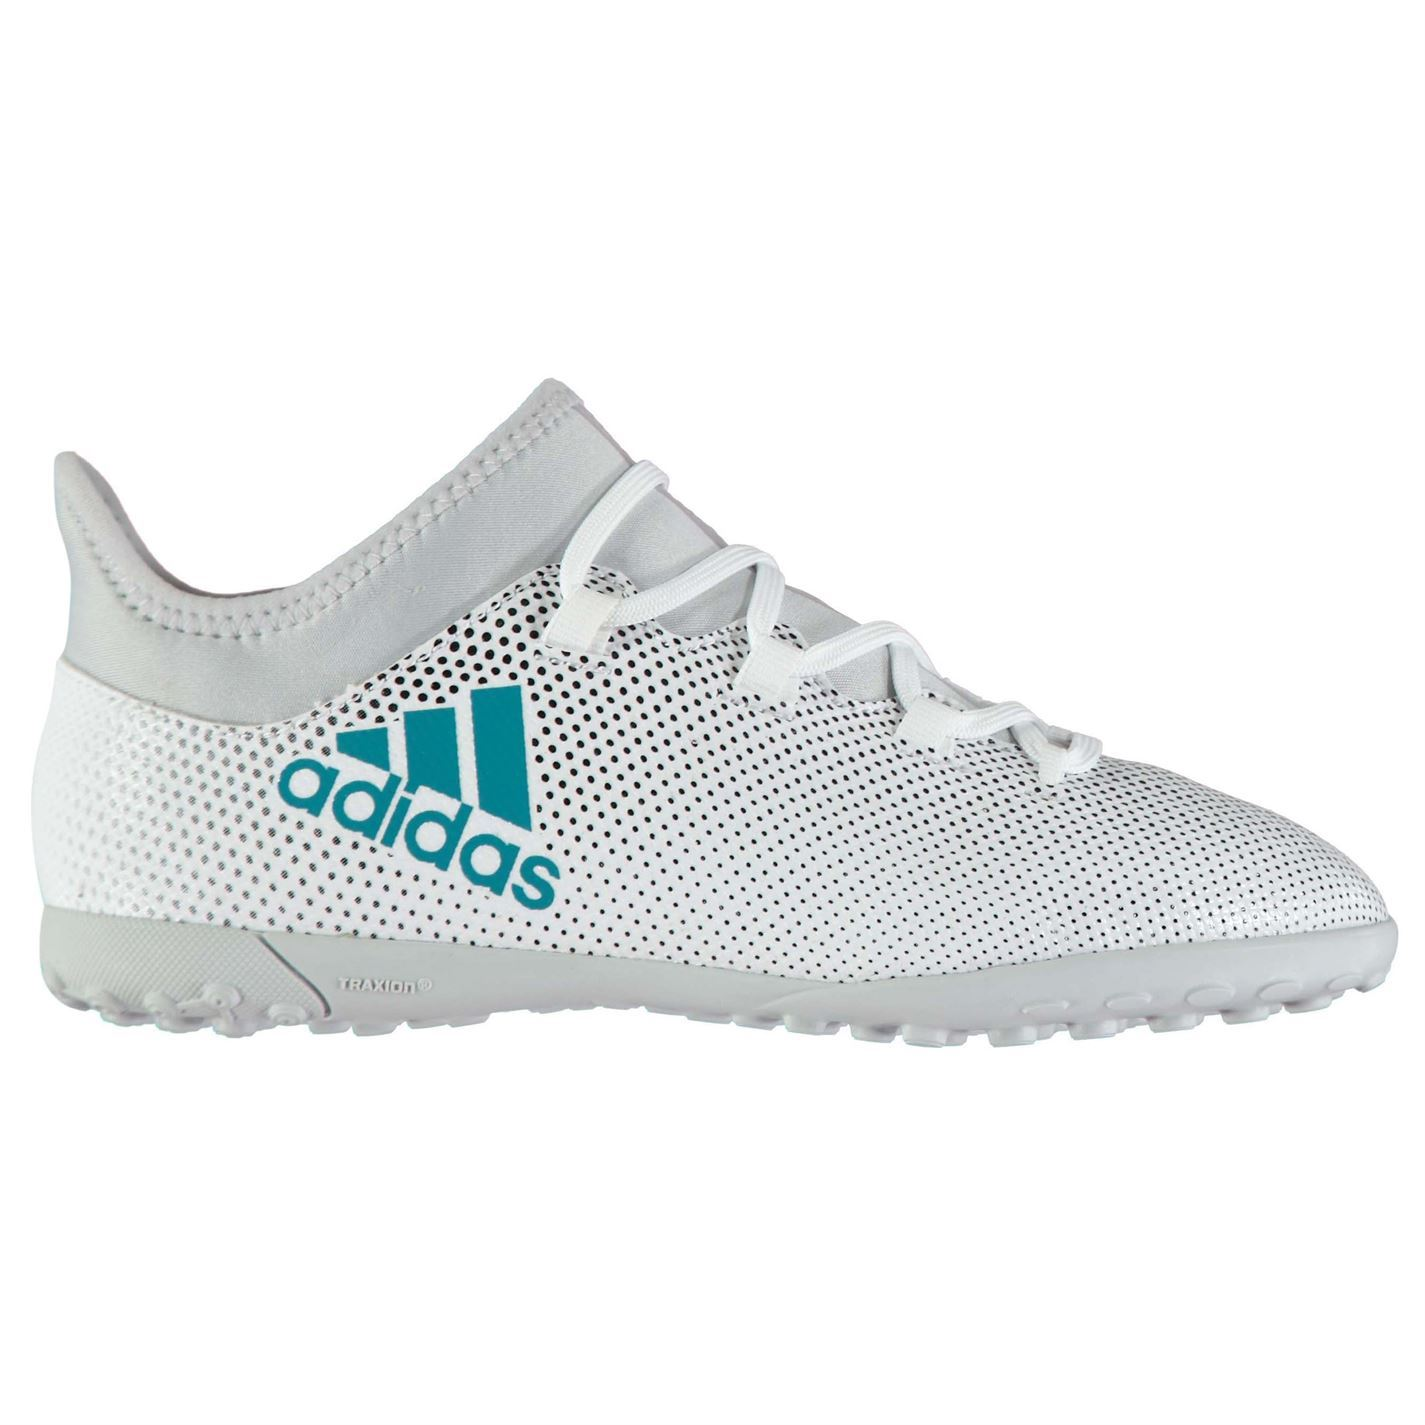 adidas astro shoes